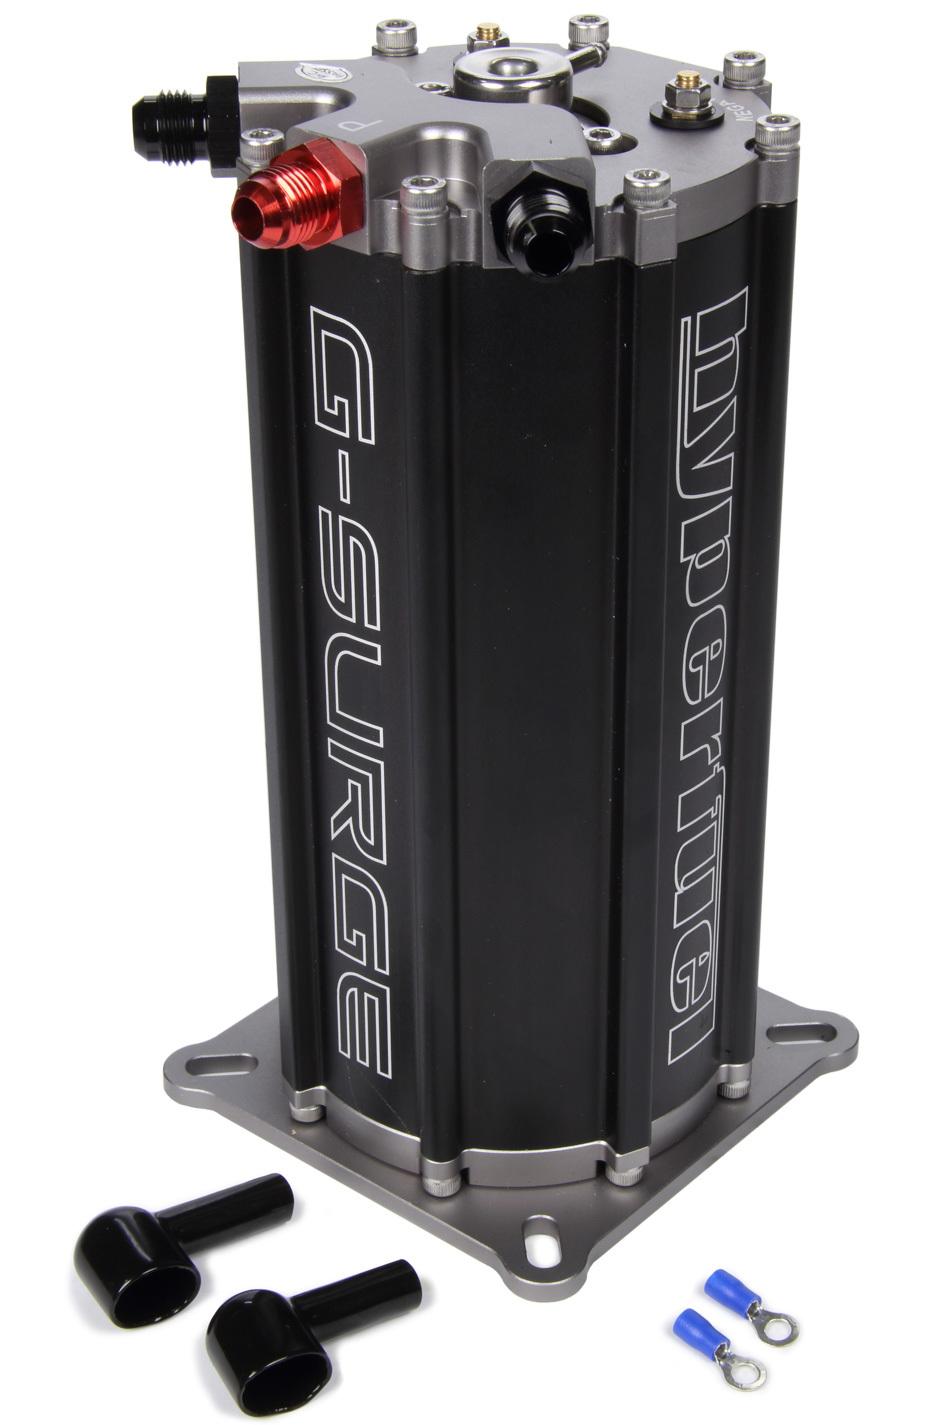 FST Carburetor 40009 Surge Tank, G-Surge Tank, 4-1/2 x 4-1/2 x 8 in Tall, Single Pump, 6 AN Fittings, Aluminum, Black Anodized, Each